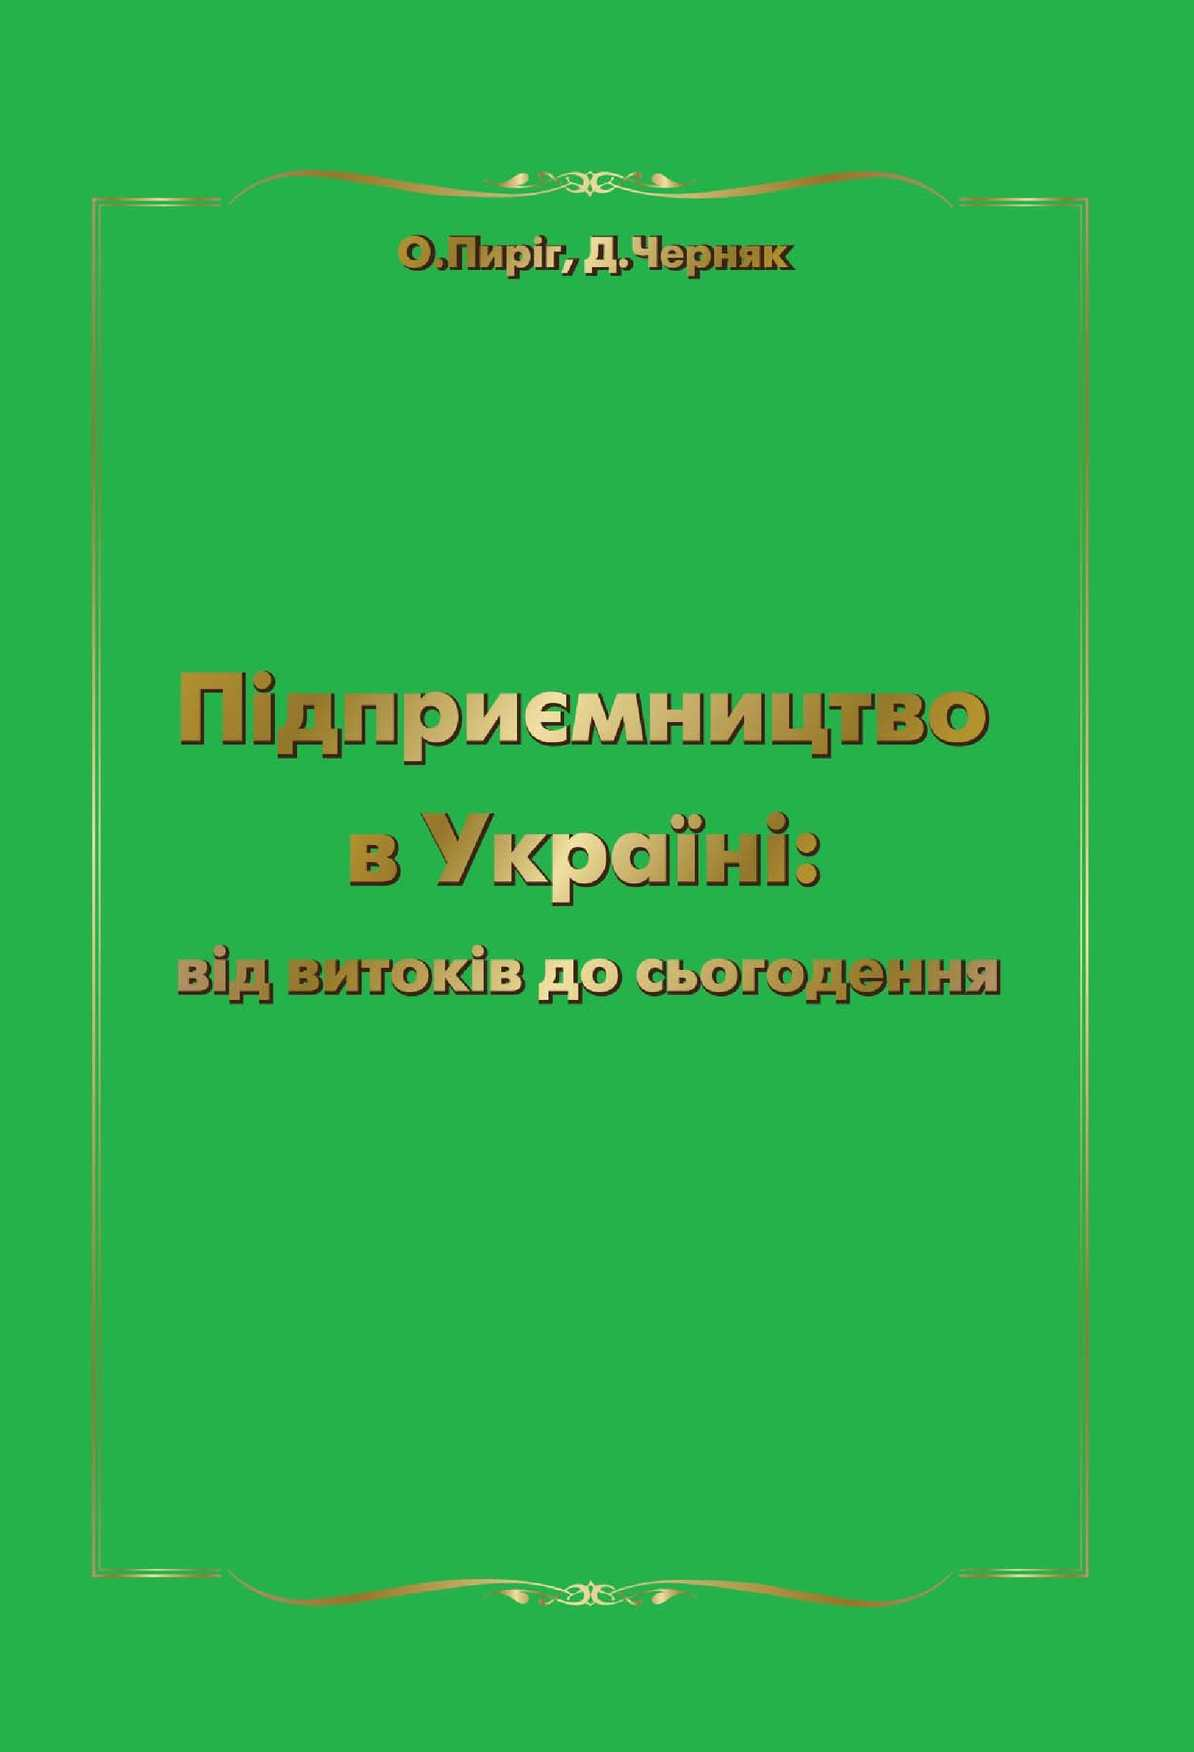 Calaméo - Book Block для превью 27b6645ec3ad7